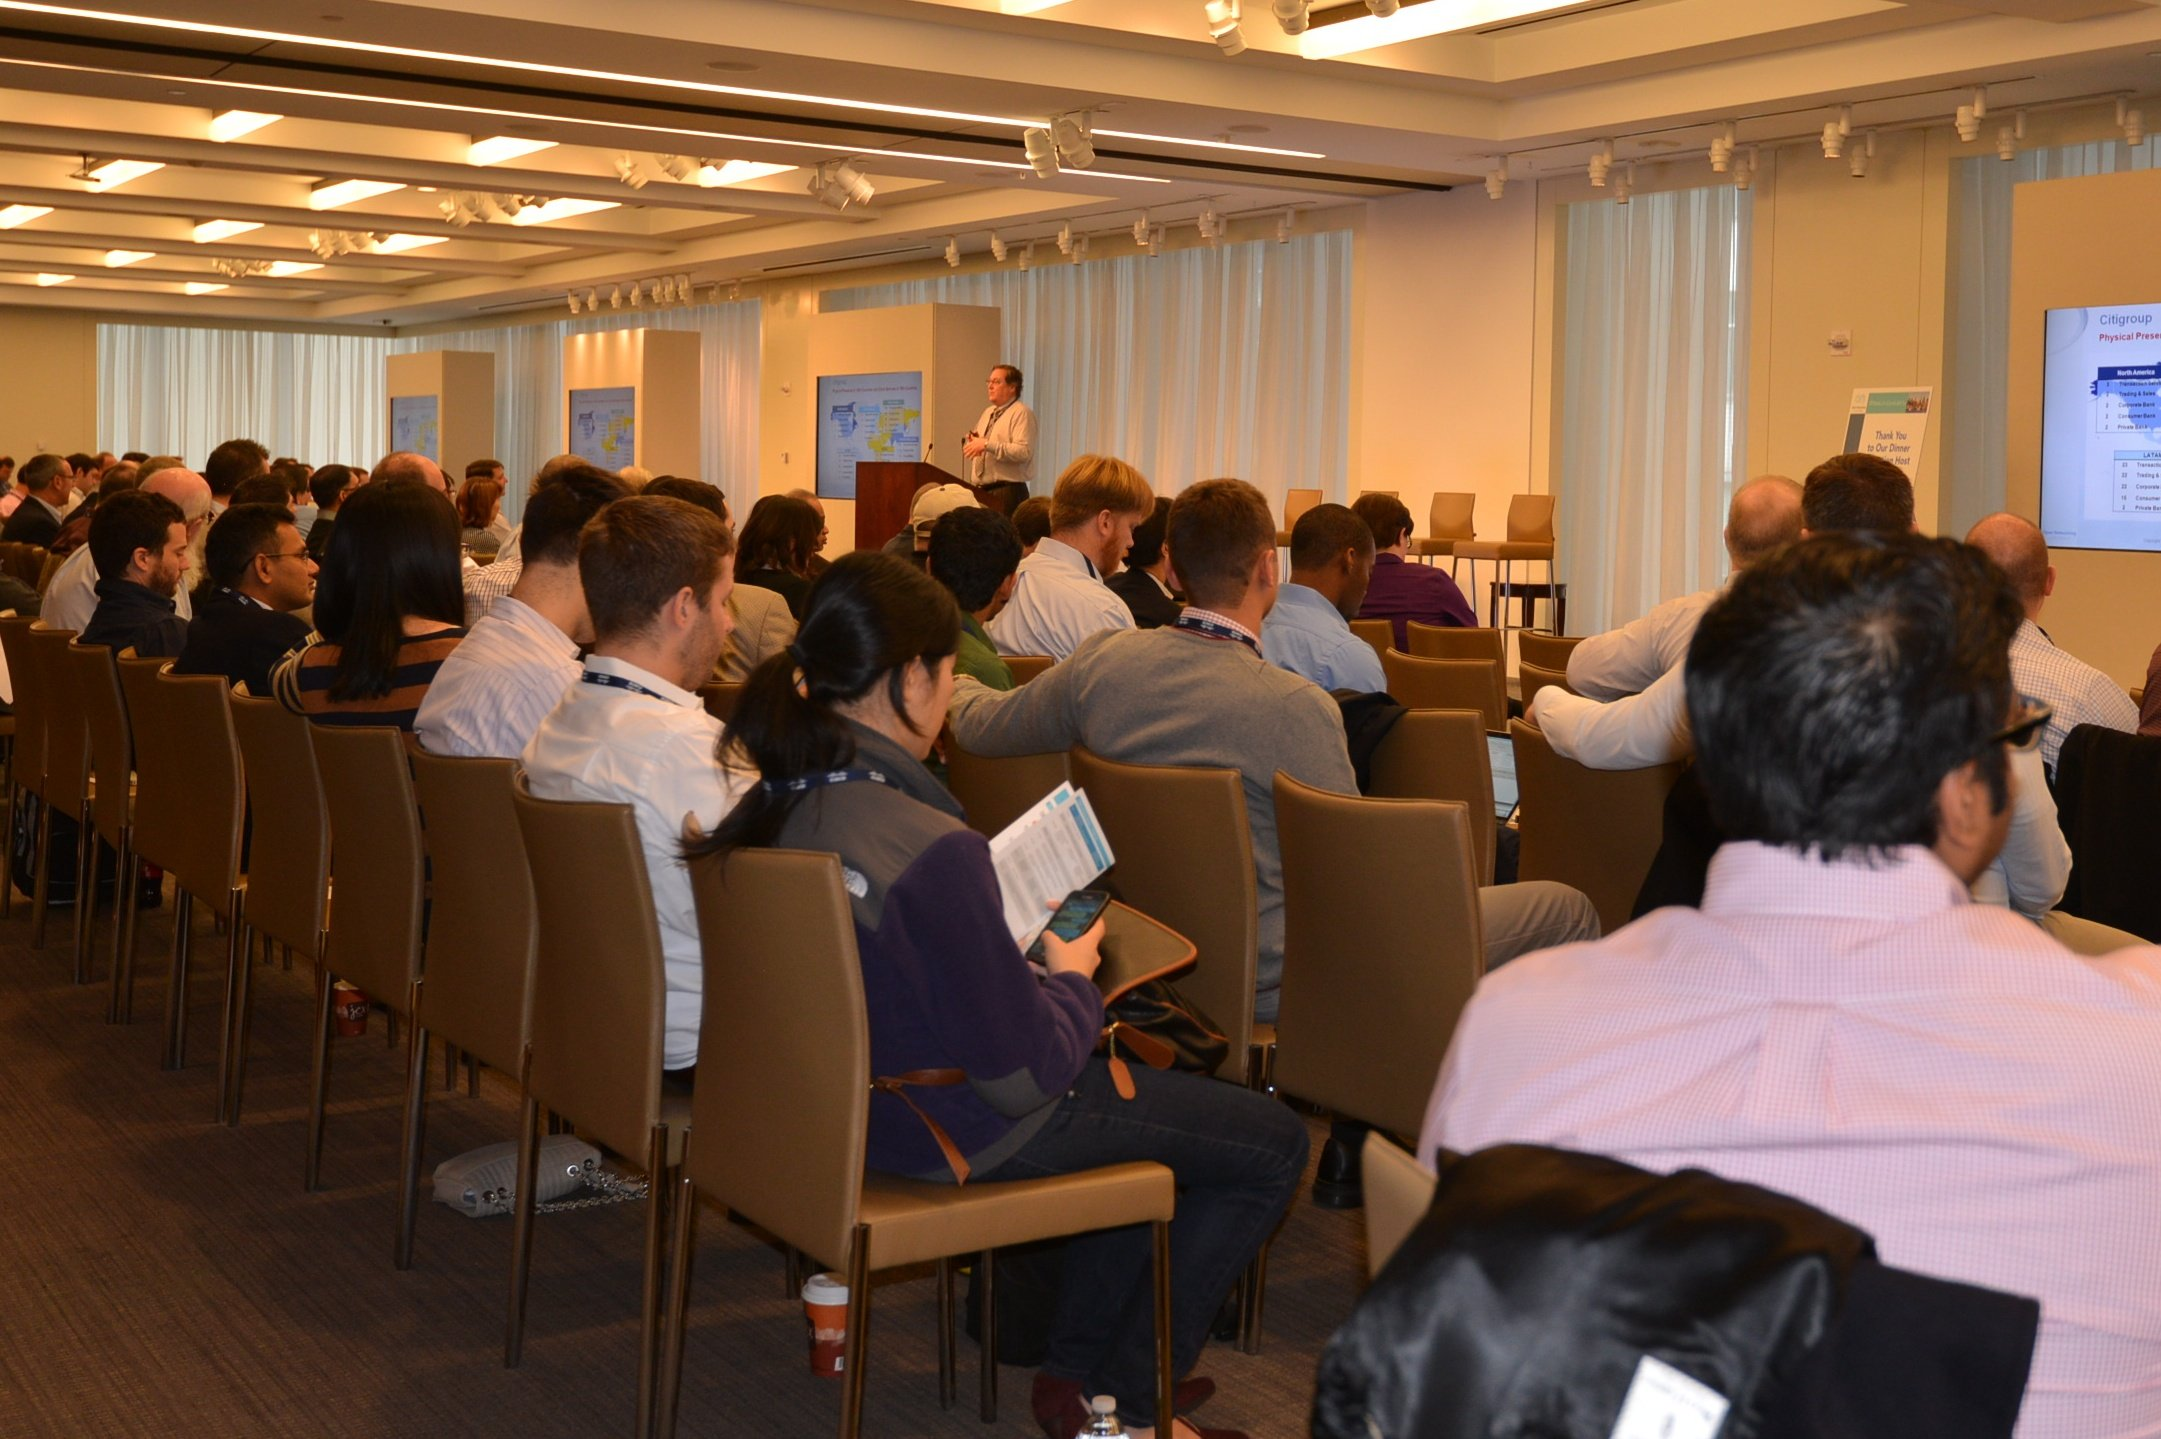 Greg Lavender delivering the Software-Defined Networking at Citigroup keynote